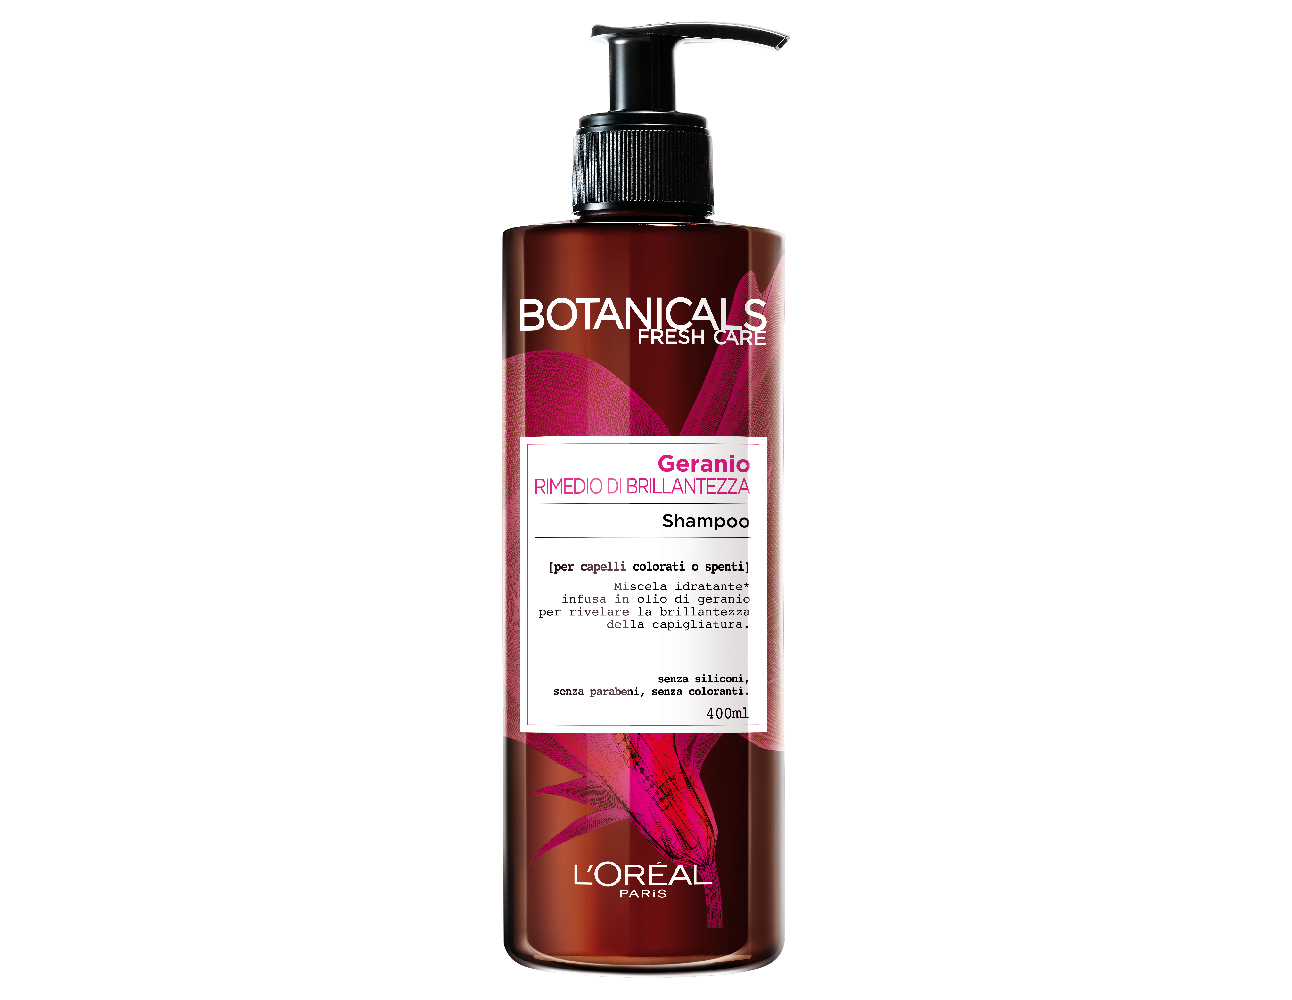 Image of Botanicals Fresh Care Shampoo Protezione Colore Geranio 400ml